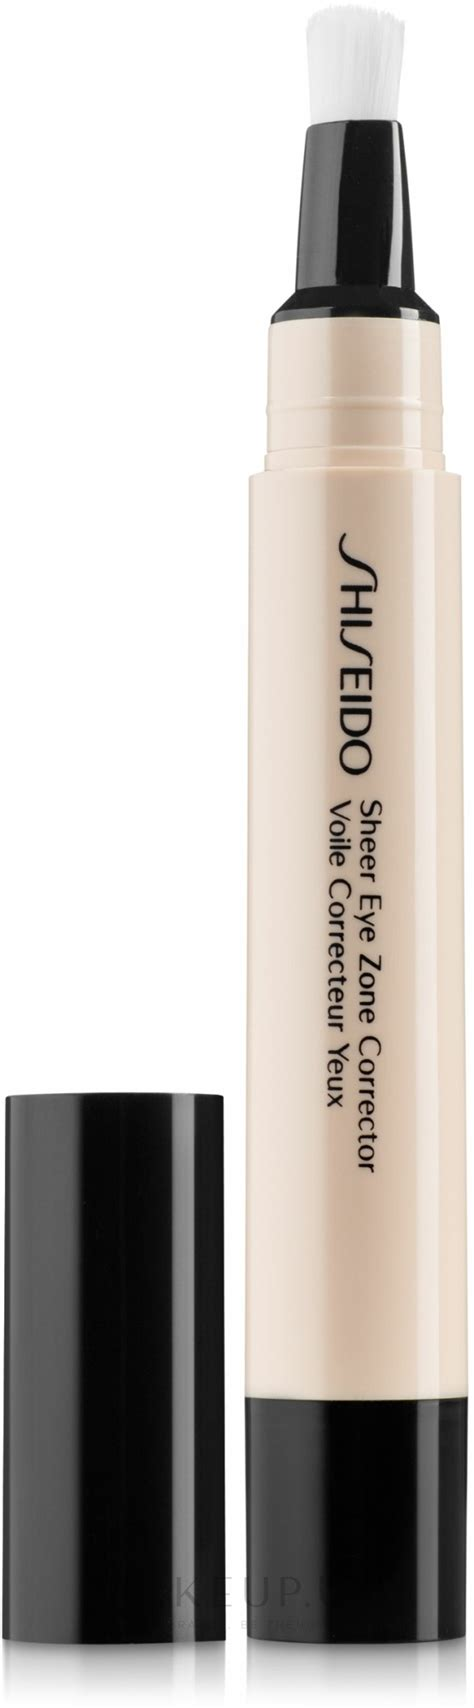 Shiseido Sheer Eye Zone Corrector   Sheer Eye Zone ...